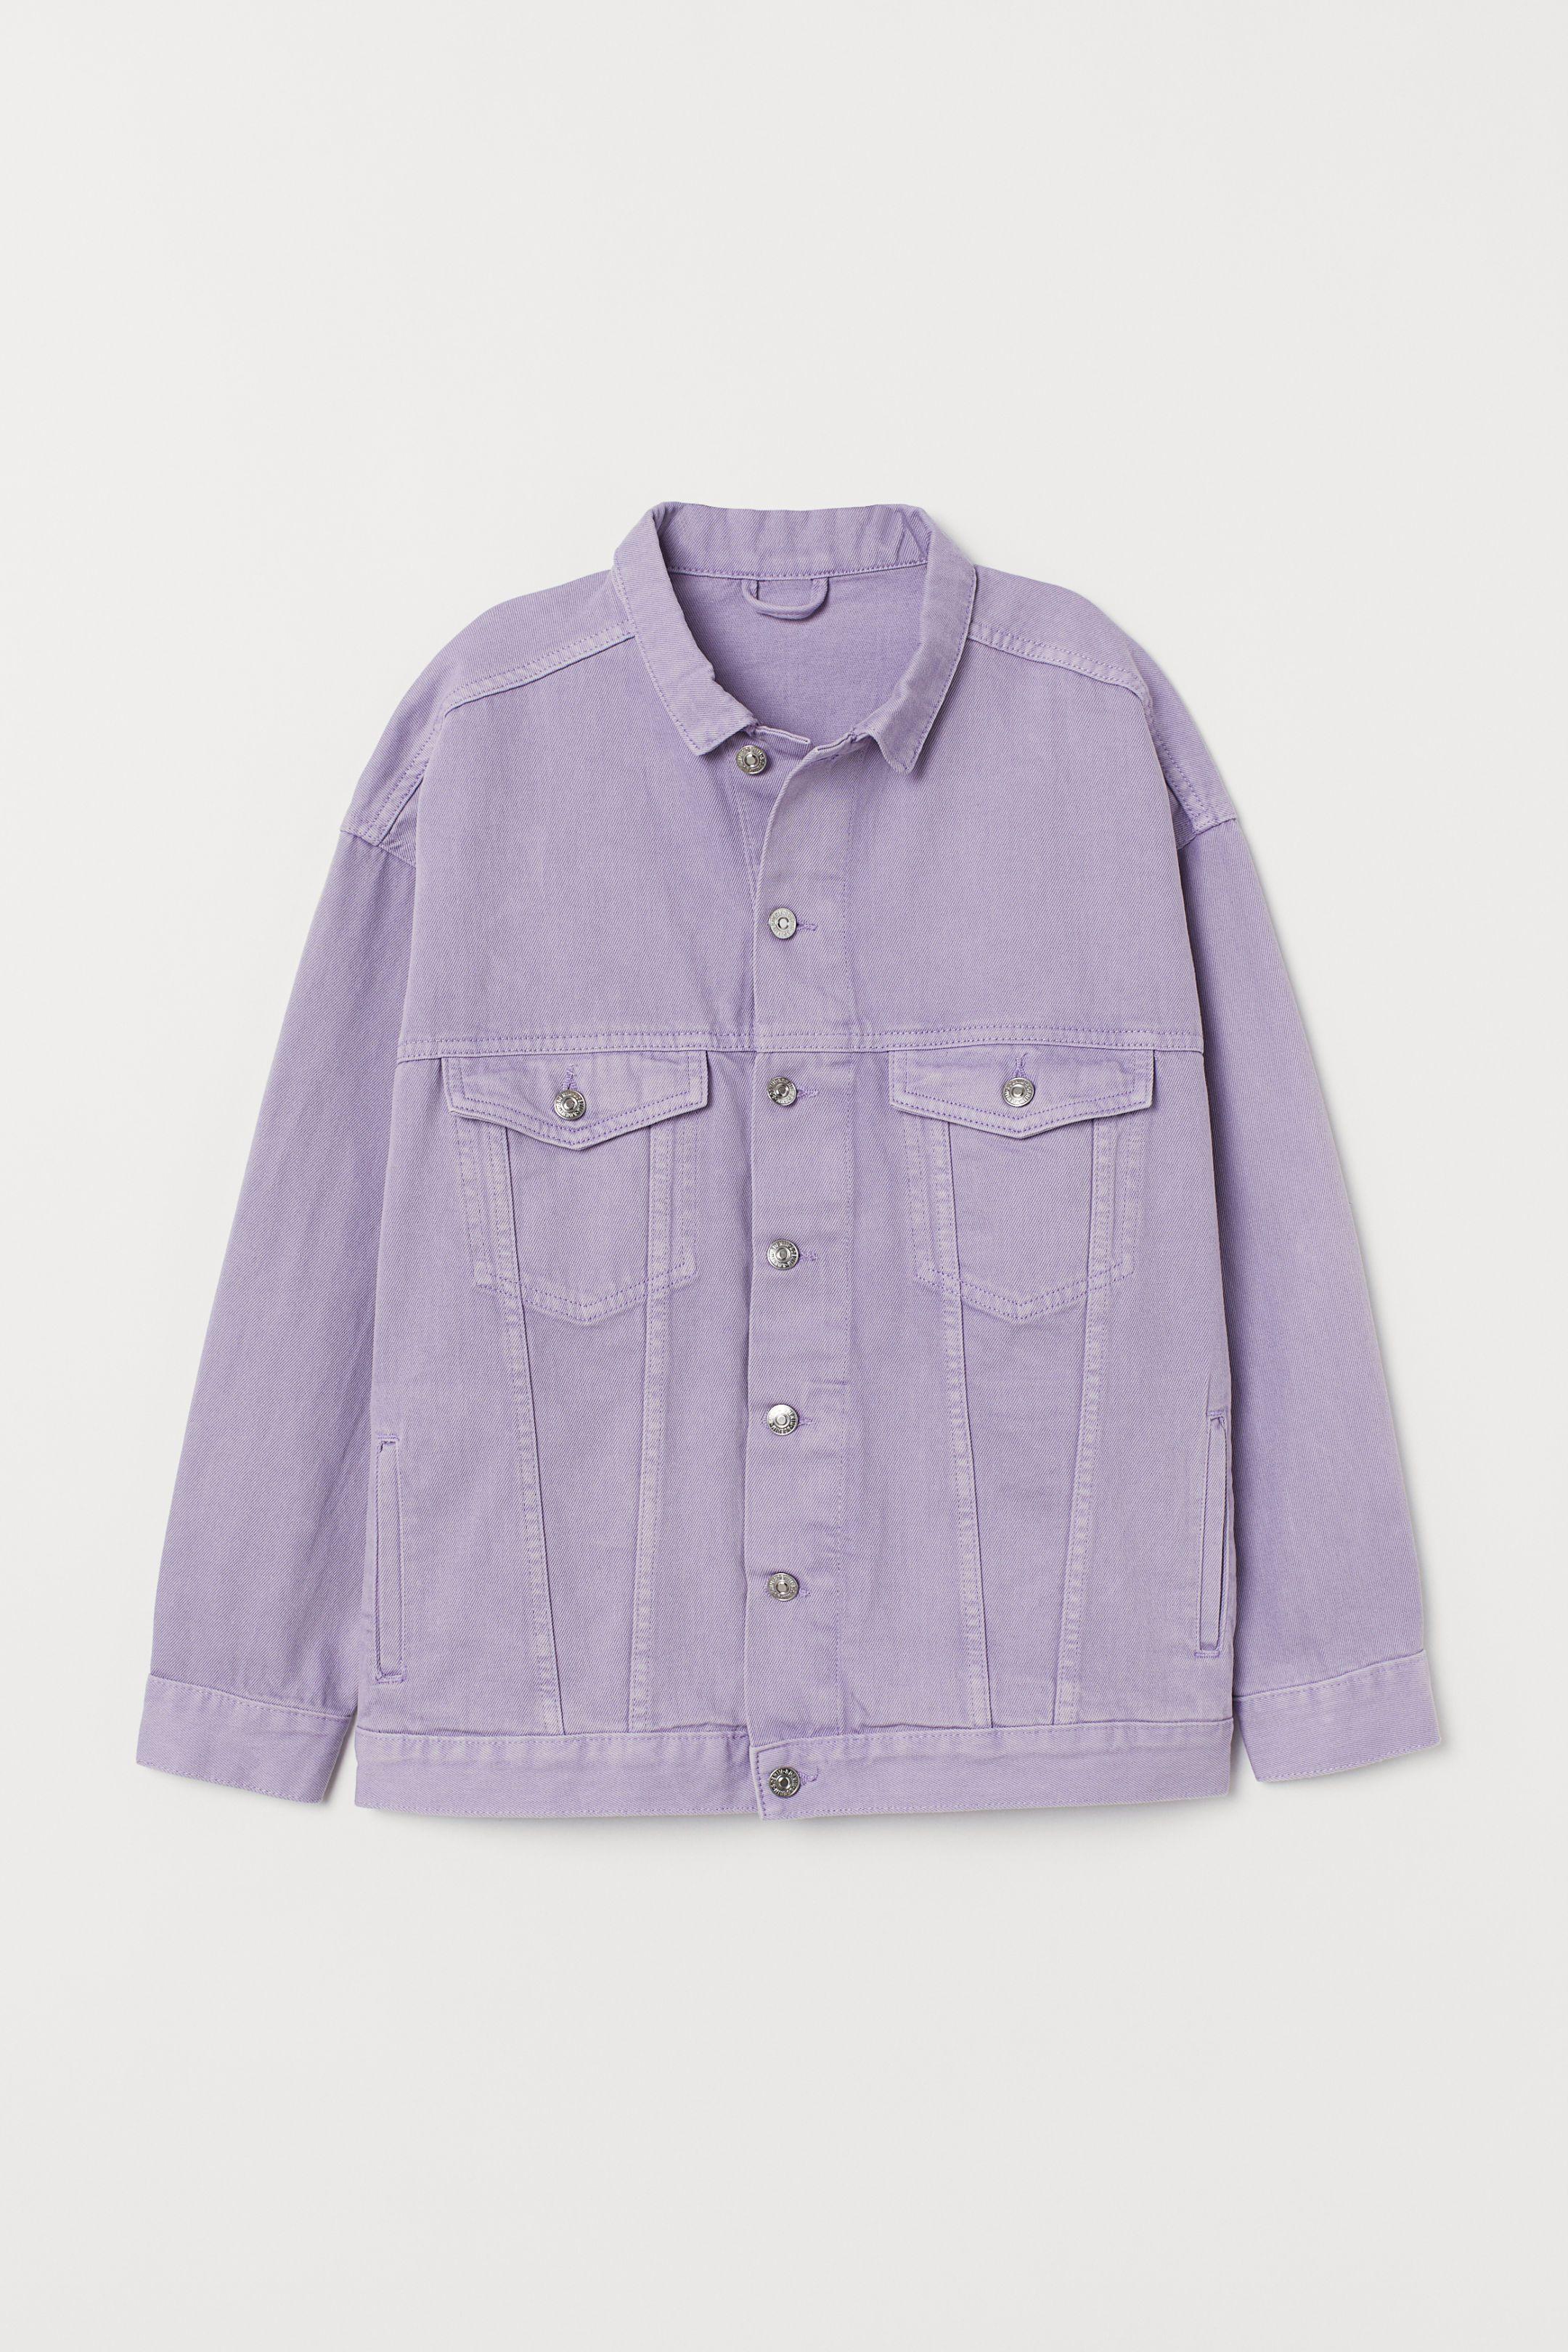 Oversized Denim Jacket Lavender Ladies H M Denim Jacket Oversized Denim Jacket Jacket Outfits [ 3240 x 2160 Pixel ]